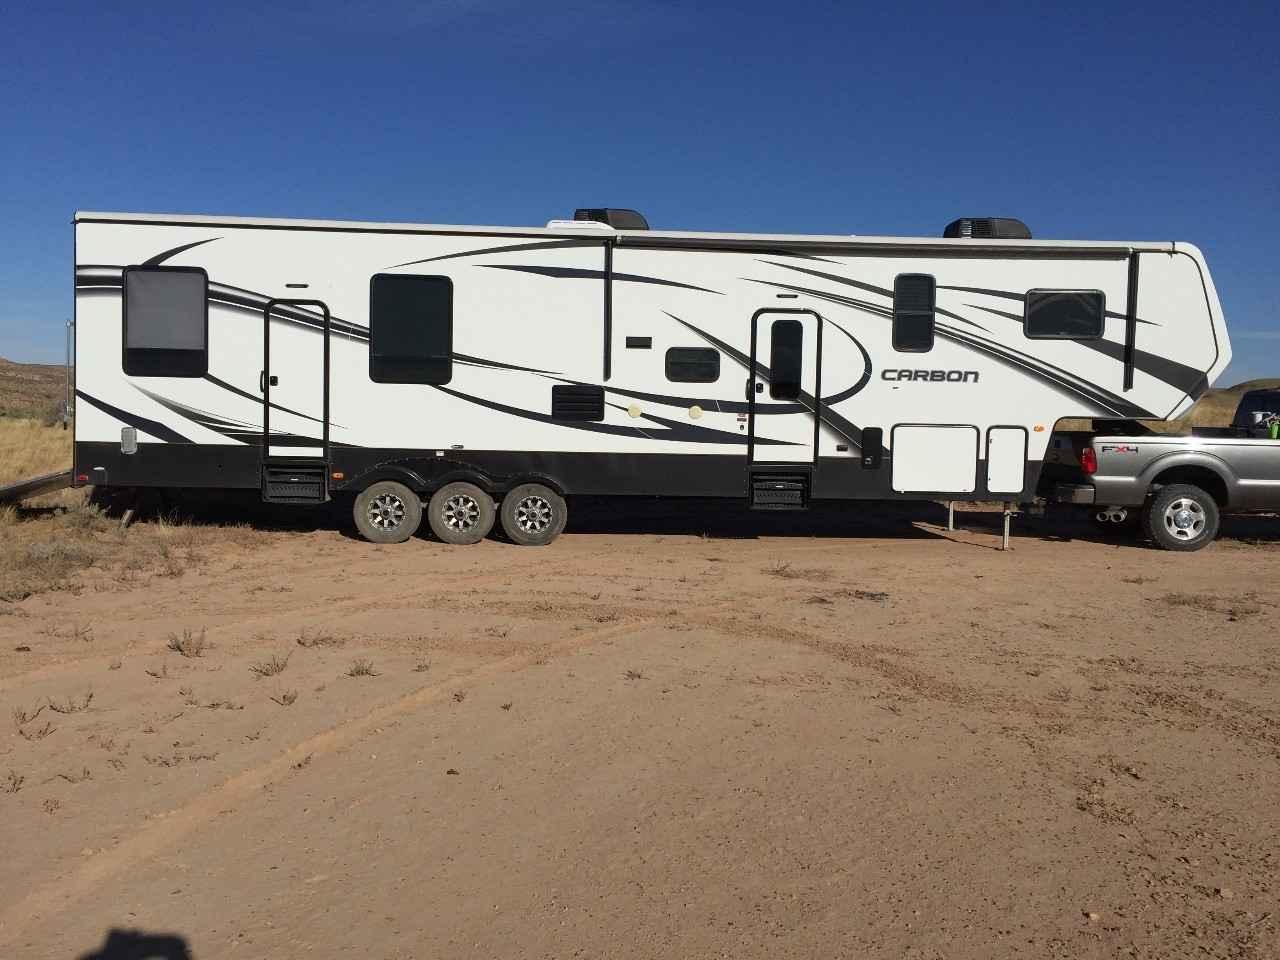 2015 Used Keystone Carbon 387 Fifth Wheel In Colorado Co